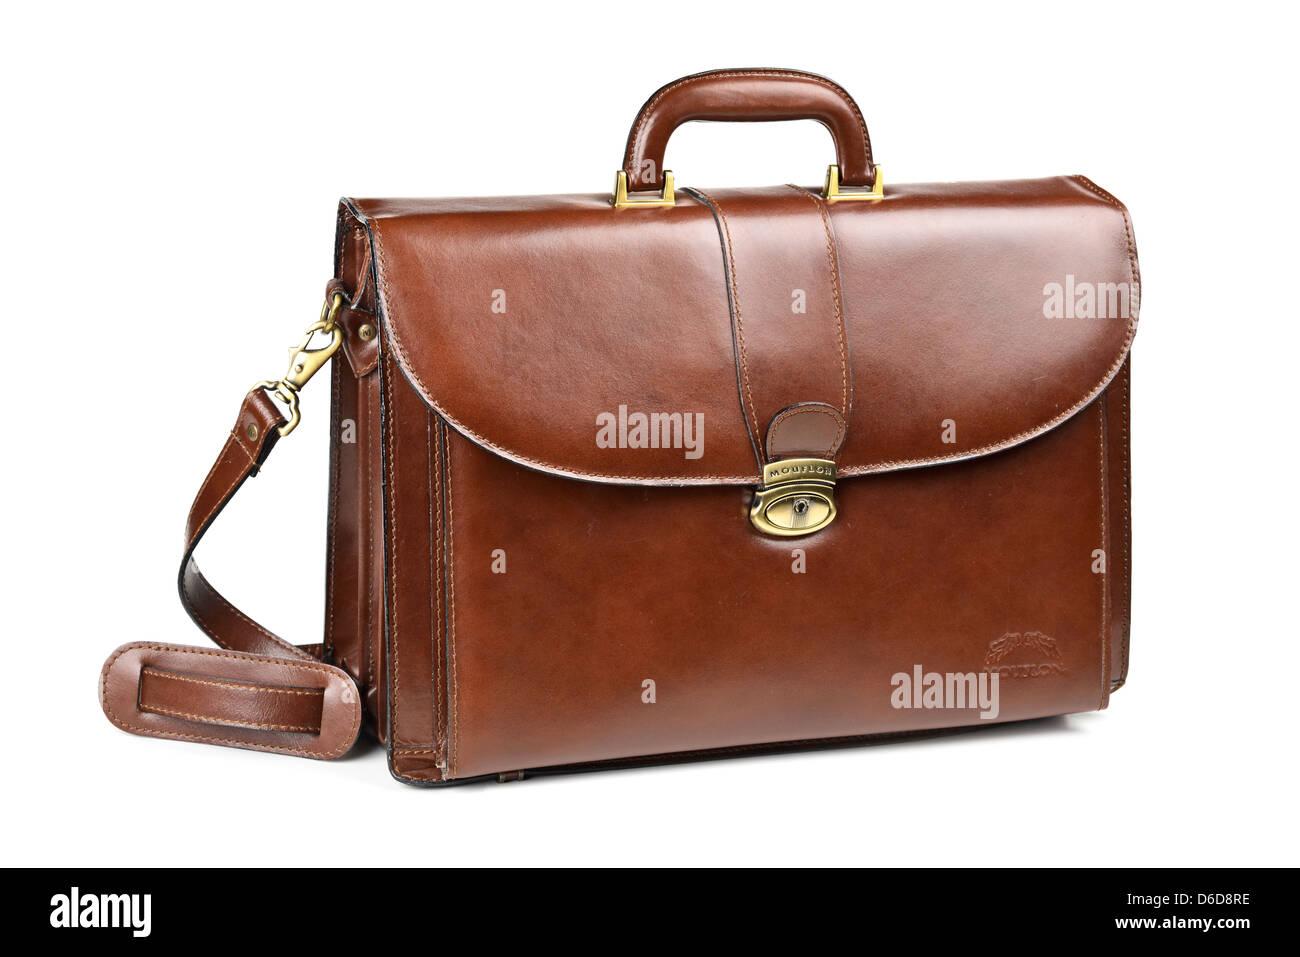 Leather Briefcase Portfolio Brown, with Shoulder Strap - Stock Image